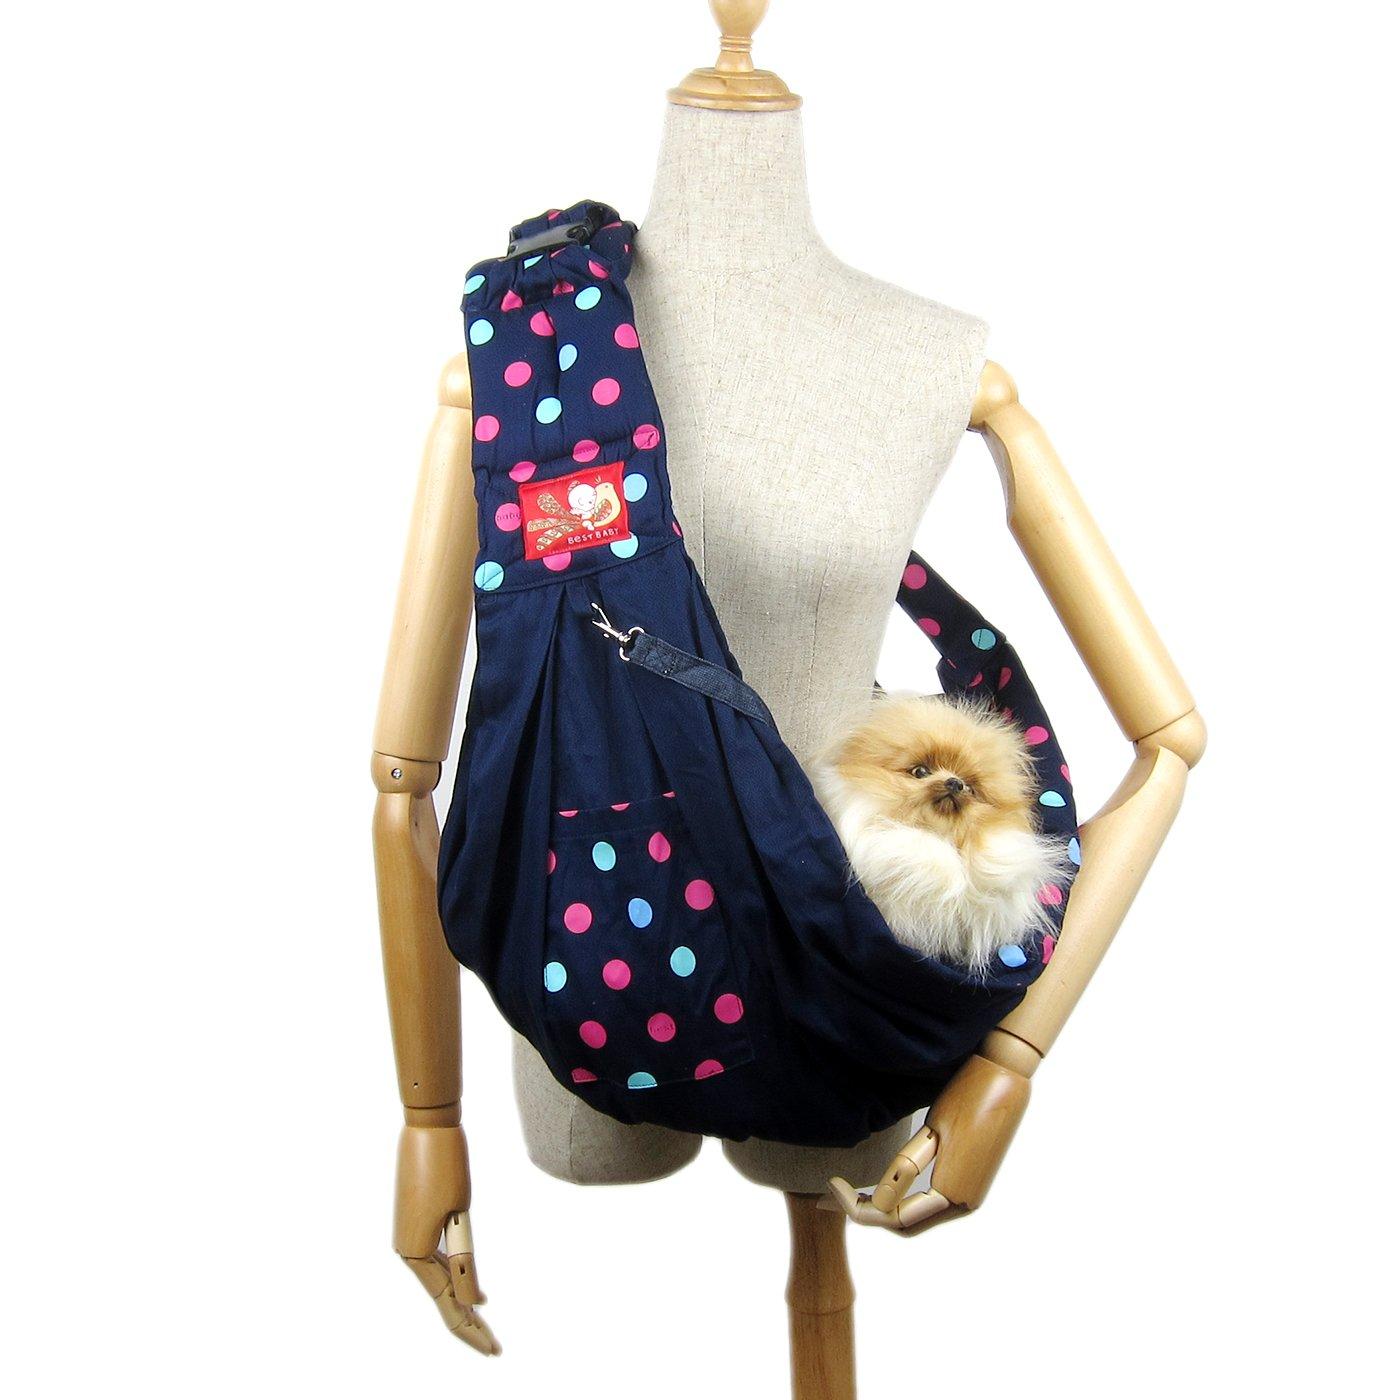 Alfie Pet by Petoga Couture - Hollis Pet Sling Carrier with Adjustable Strap - Color: Navy